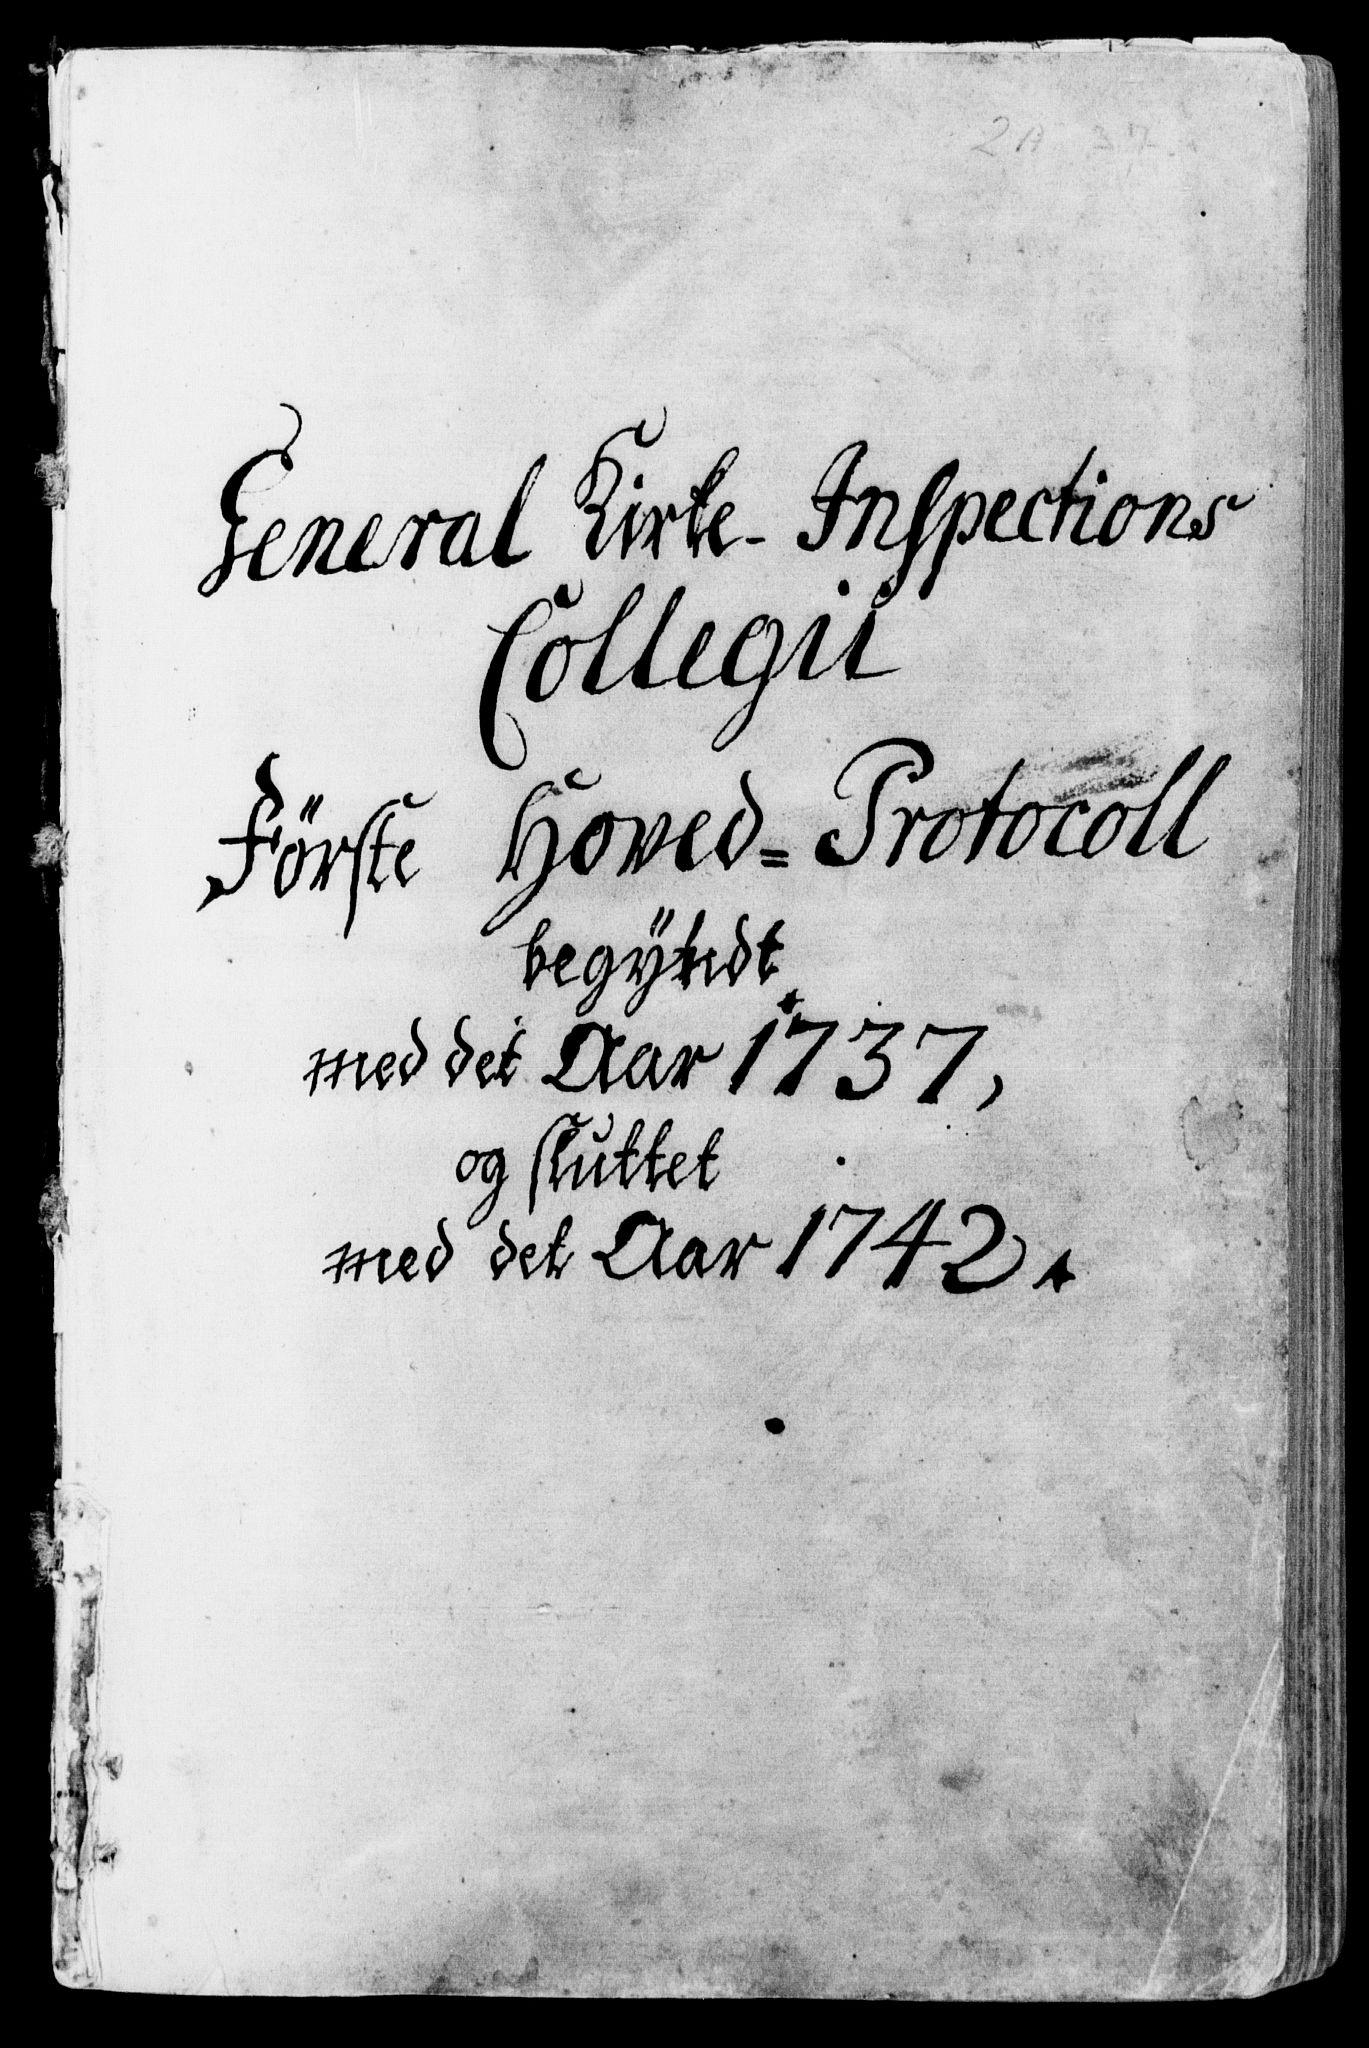 DRA, Generalkirkeinspektionskollegiet, F4-01/F4-01-01: General Kirke-Inspections Collegii Hovedprotocoll, 1737-1742